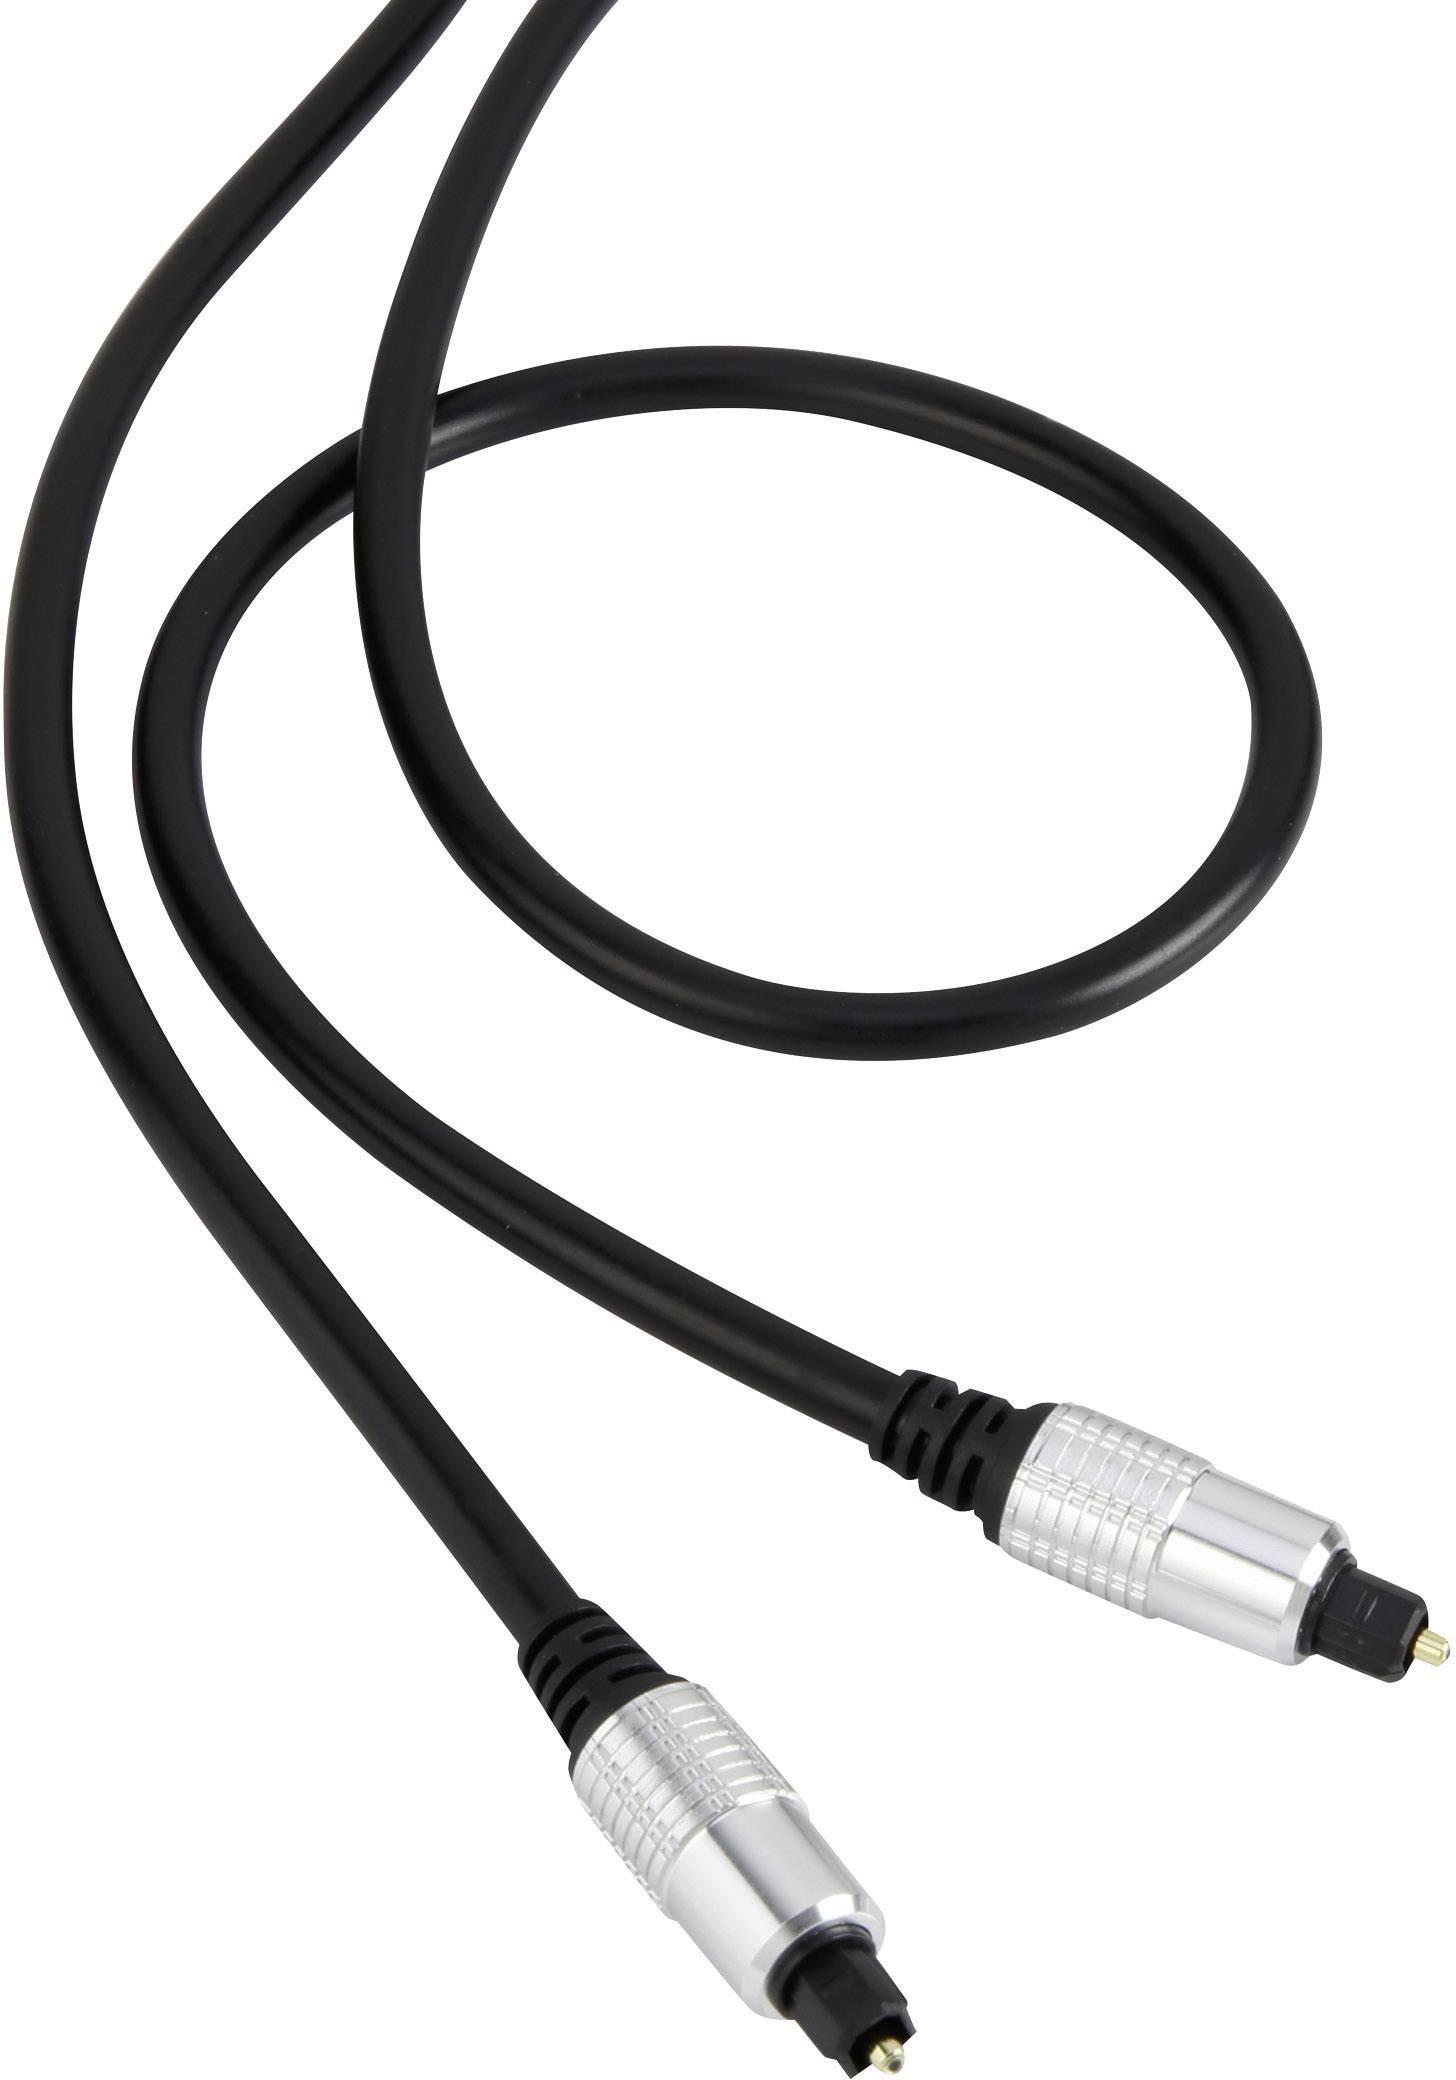 Digitální audio kabel Toslink SpeaKa, 1,50 m, černá